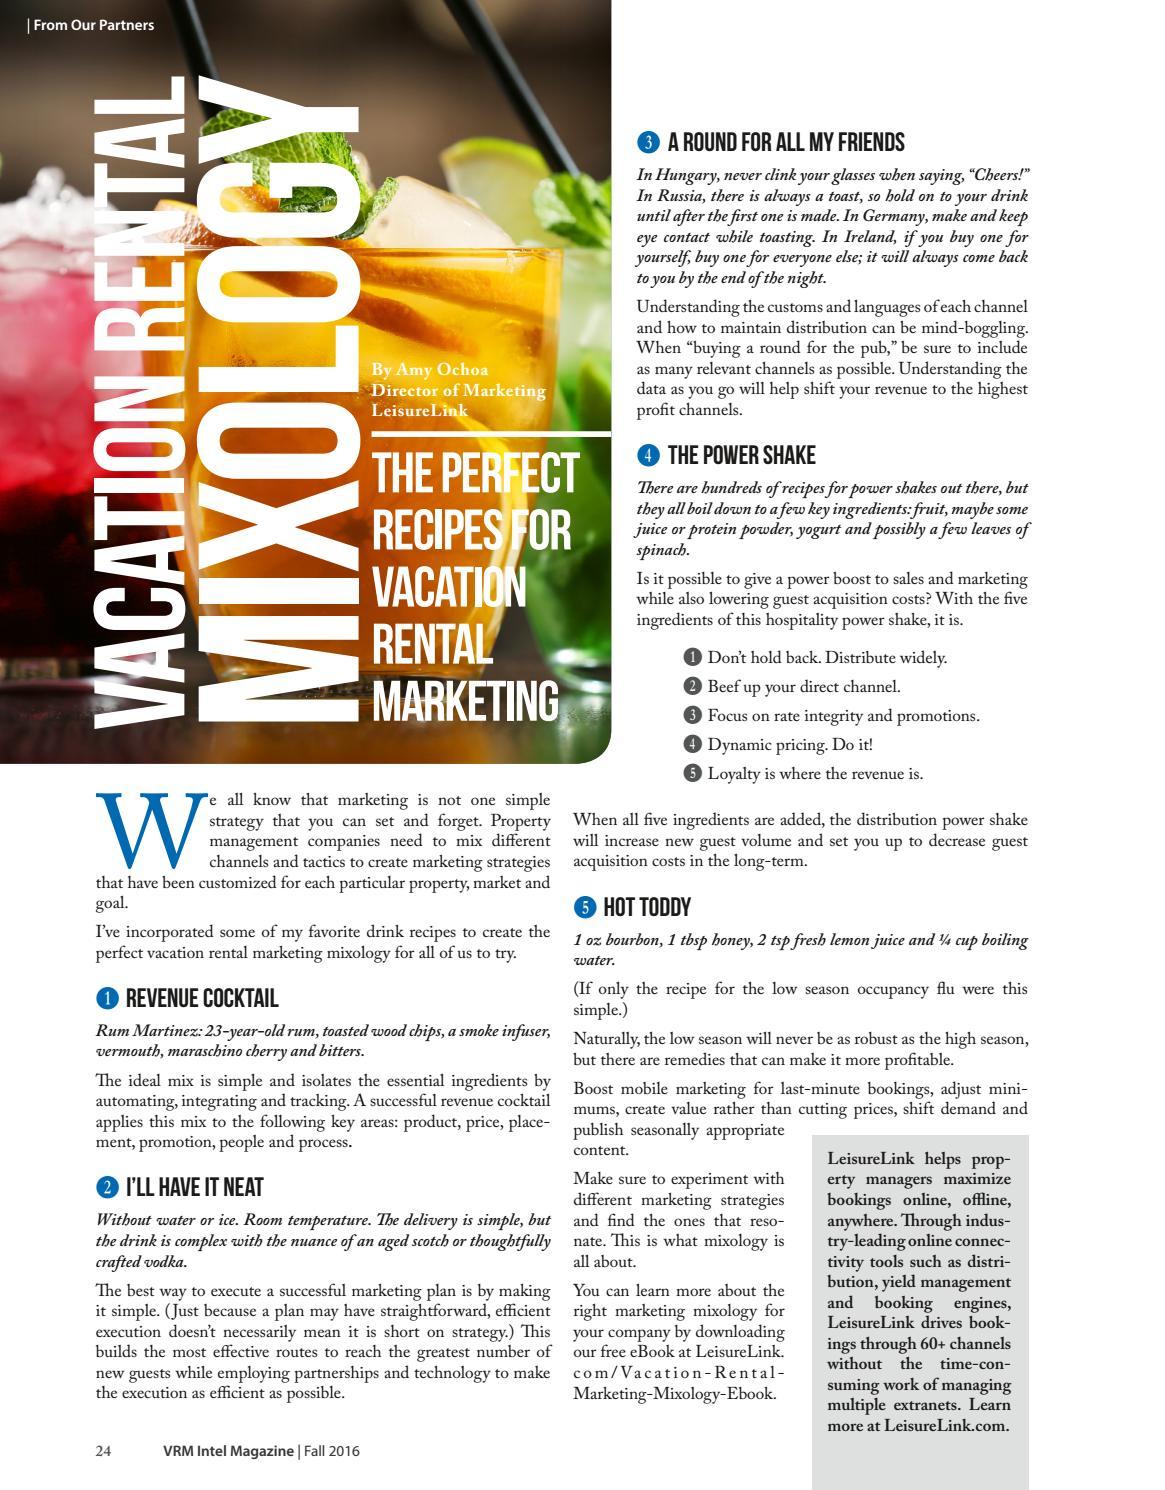 VRM Intel Magazine Fall 2016 by Amy Hinote - issuu